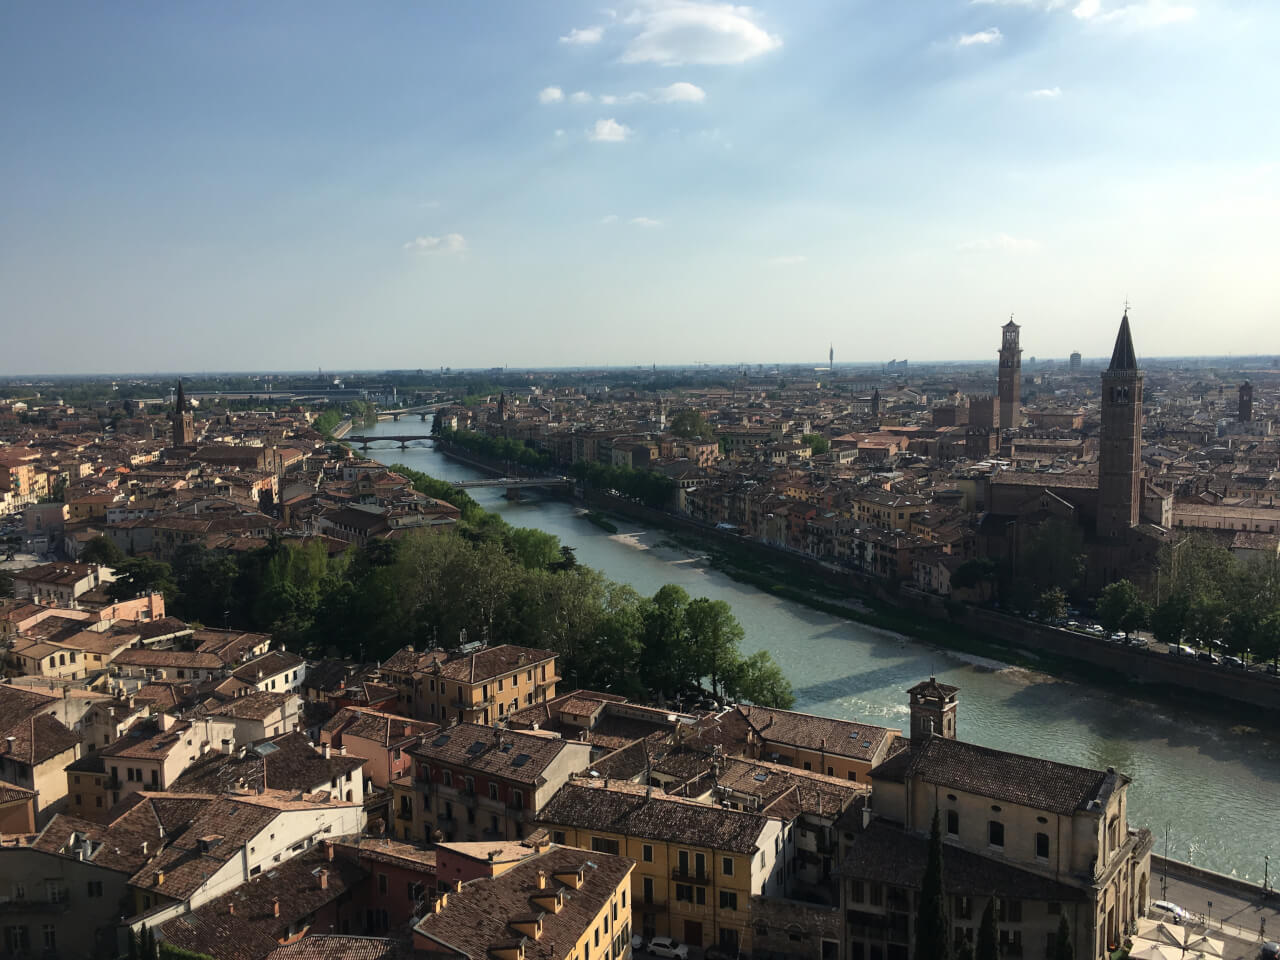 In fair Verona (& Padova) where we lay our scene: Travels in the Veneto